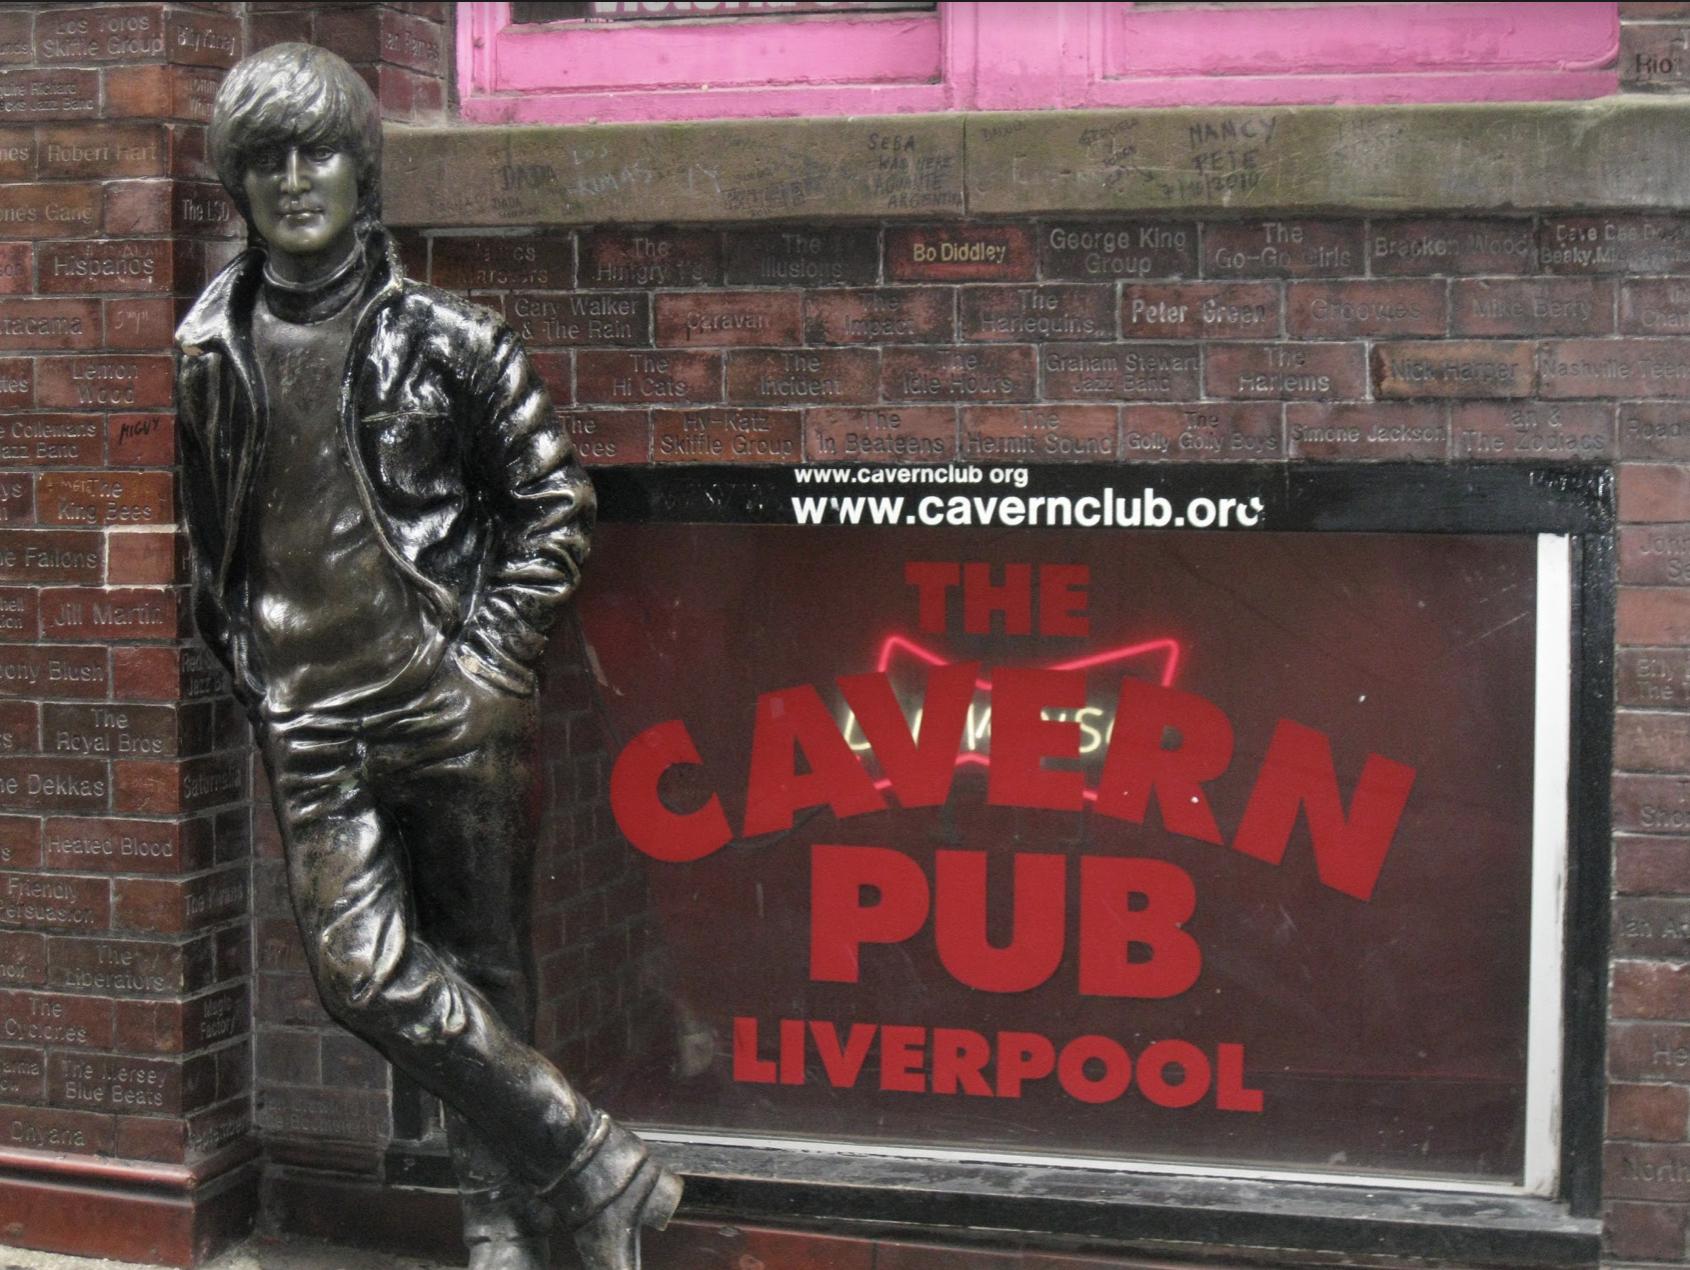 The Cavern Pub Liverpool